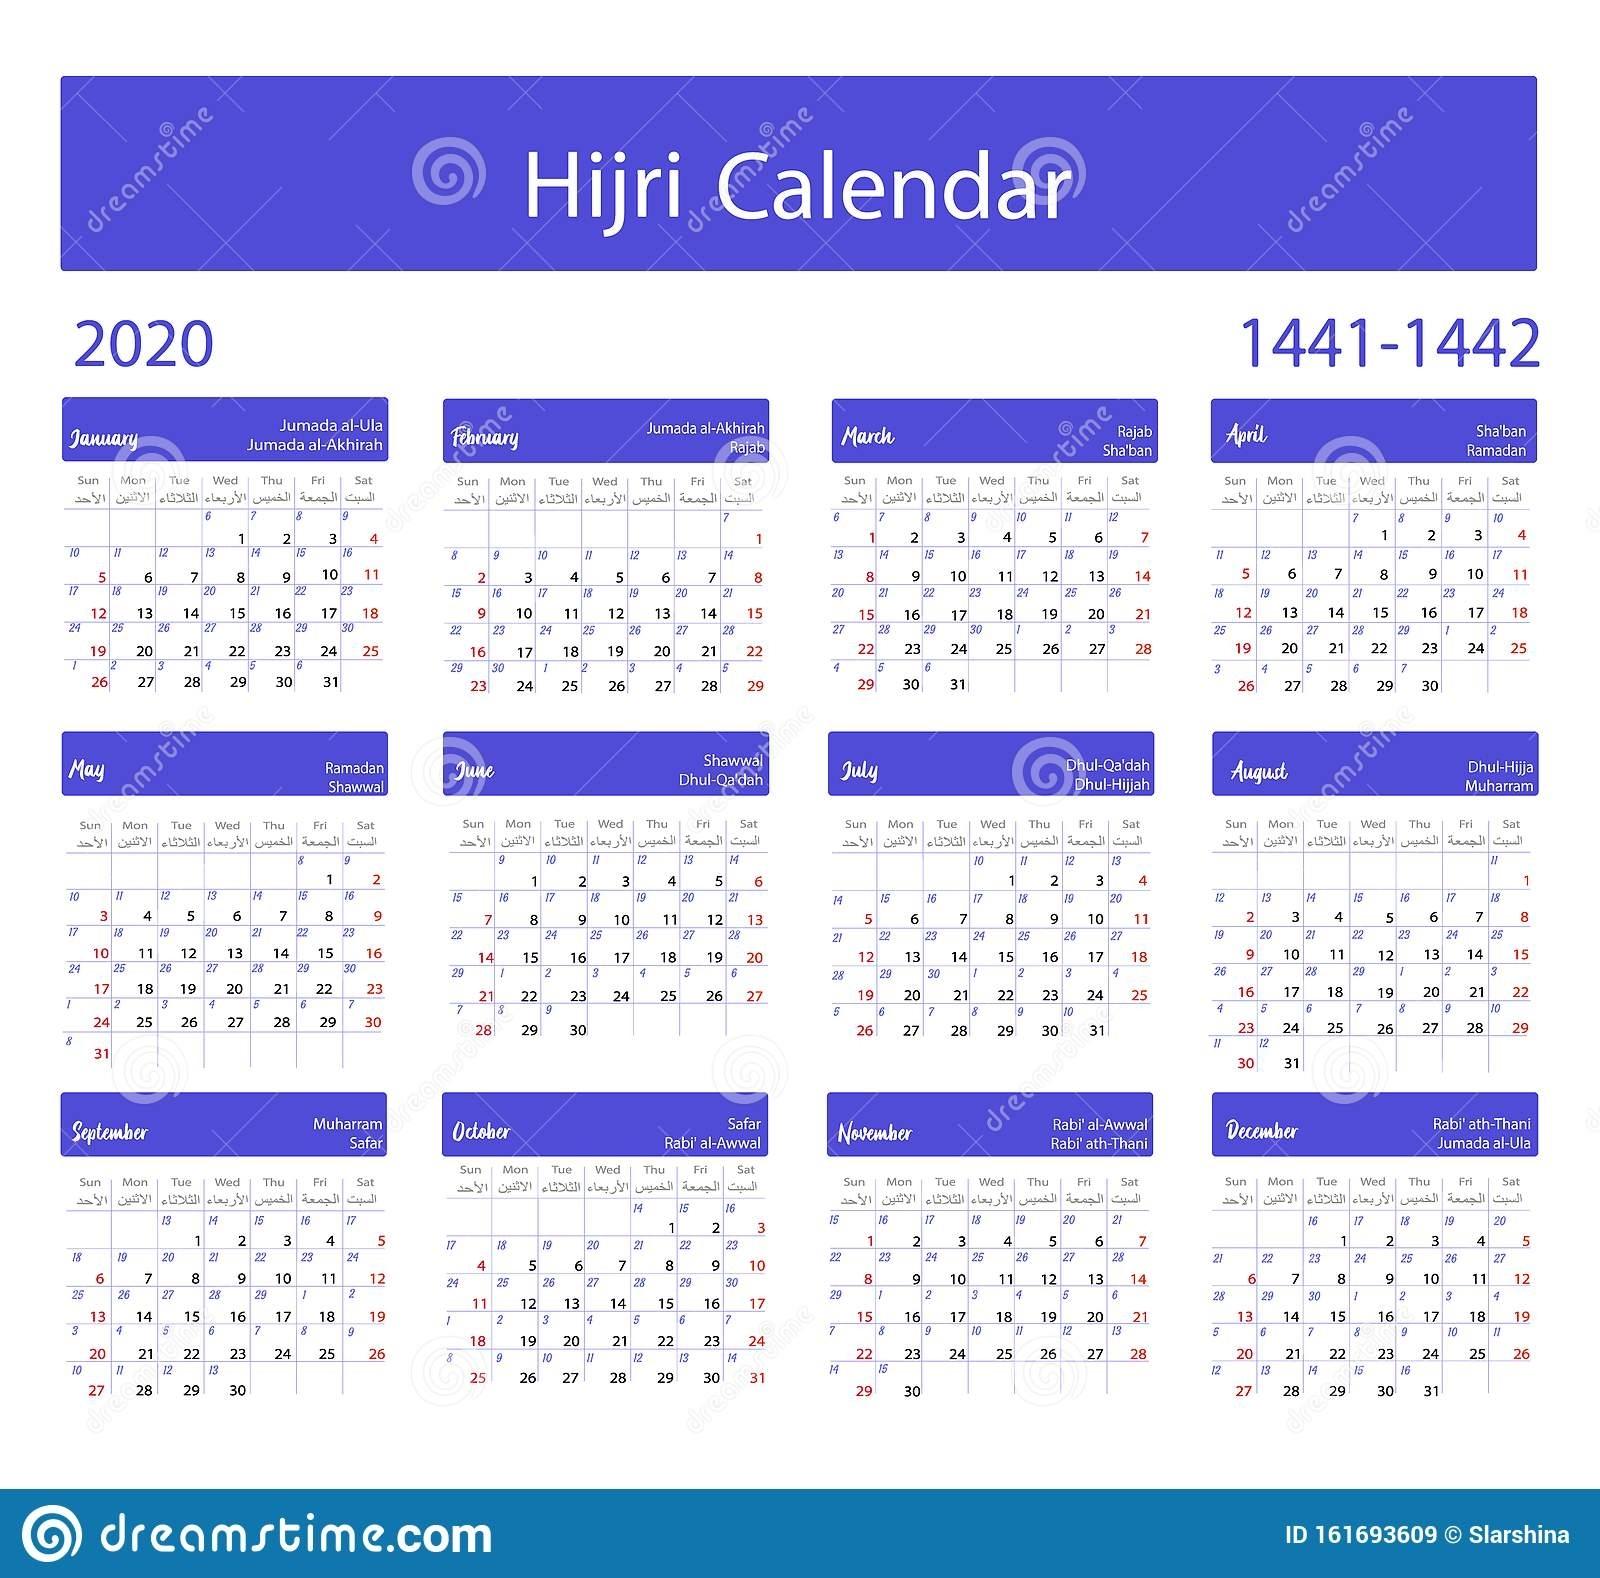 Get Urdu Calendar 2000